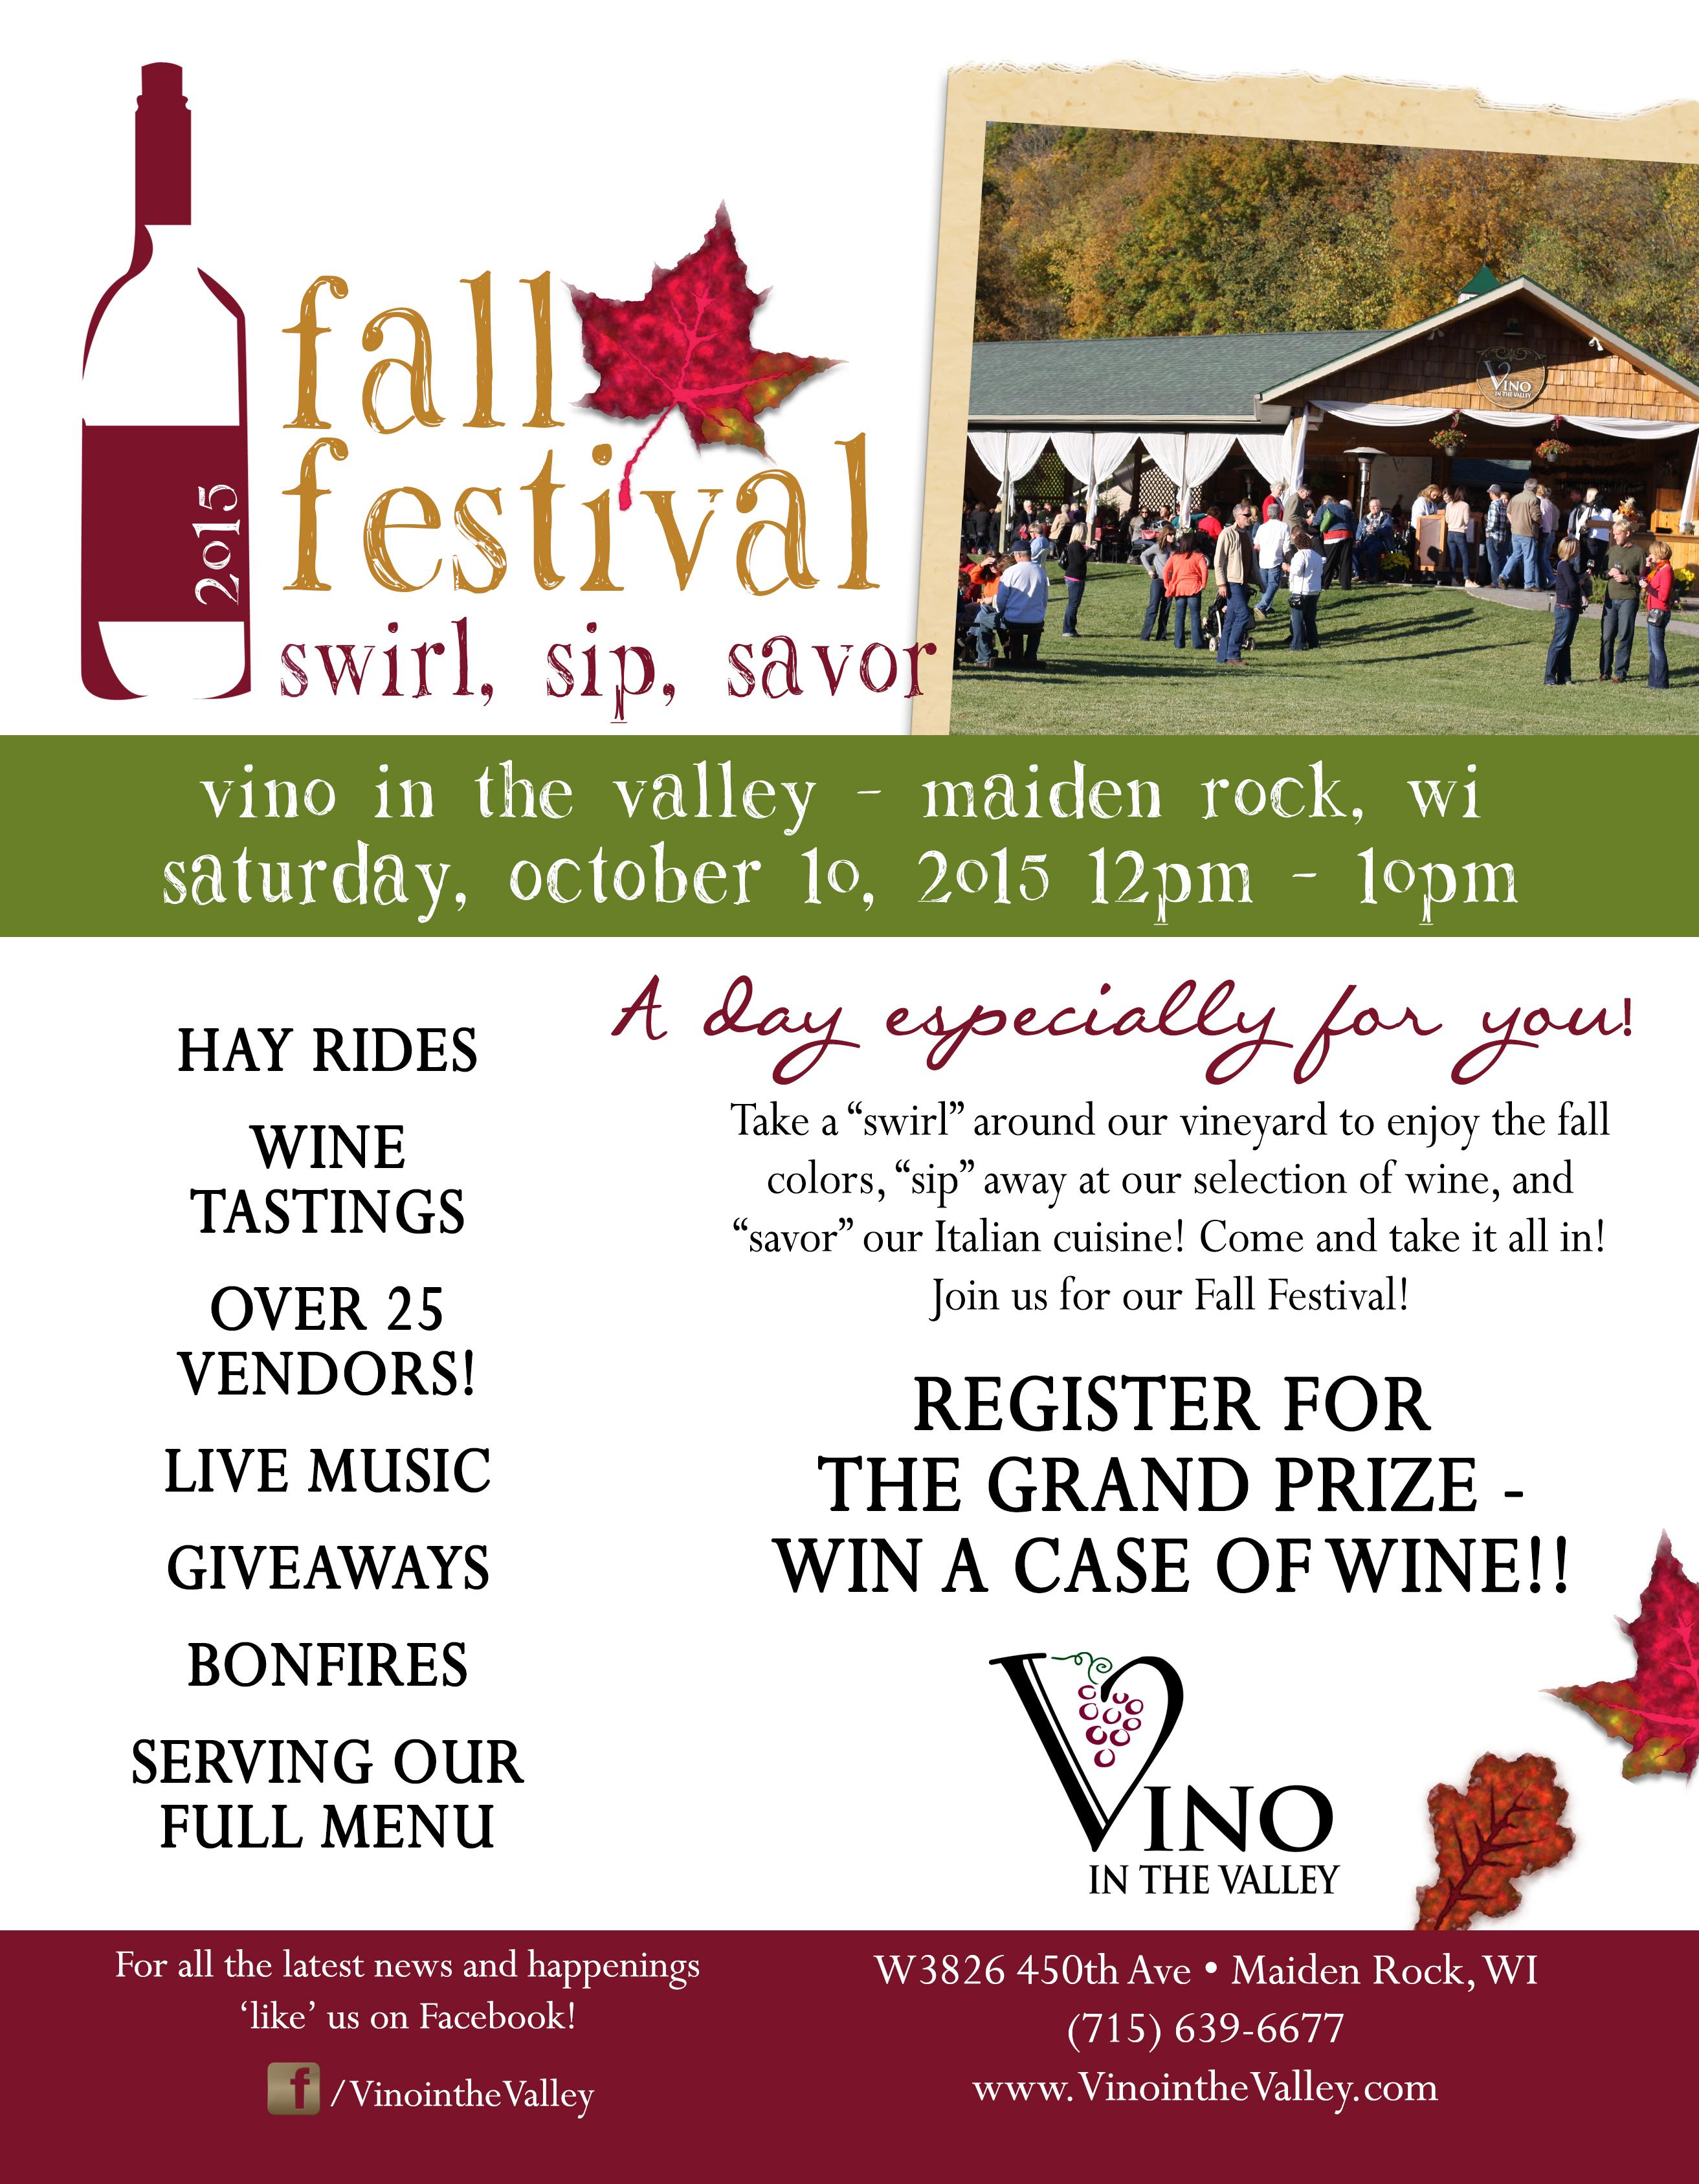 Fall Festival Flyer 2015